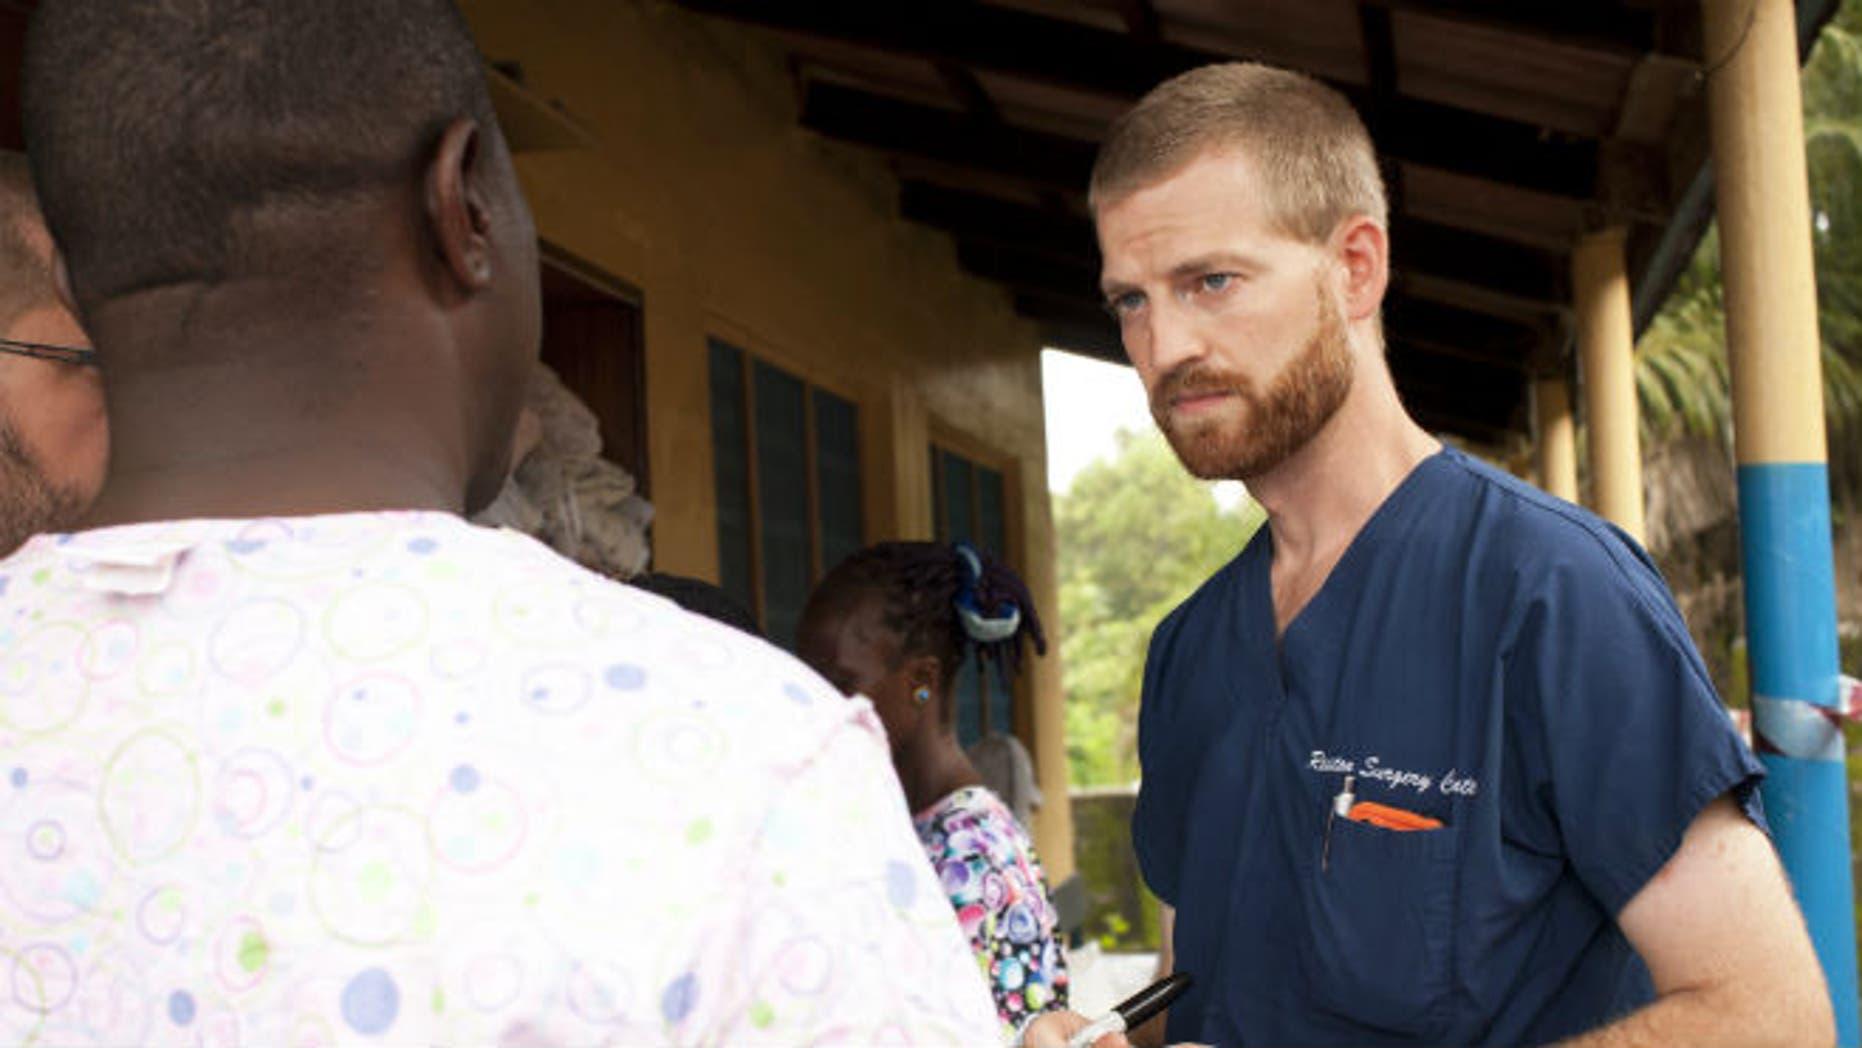 Dr. Kent Brantly, courtesy Samaritan's Purse